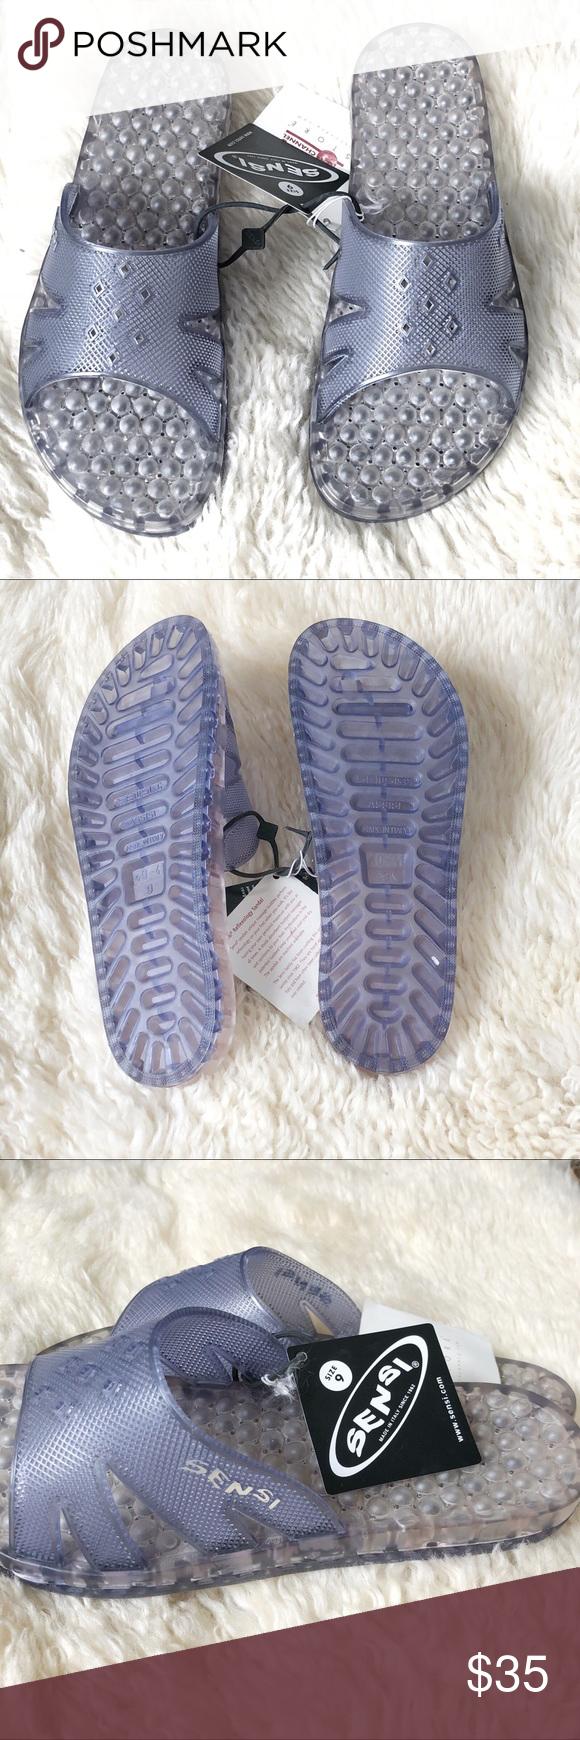 6dc6c612f14adb NEW Sensi Reflexology Spa Slides Sandals Size 9 Sensi Reflexology ...